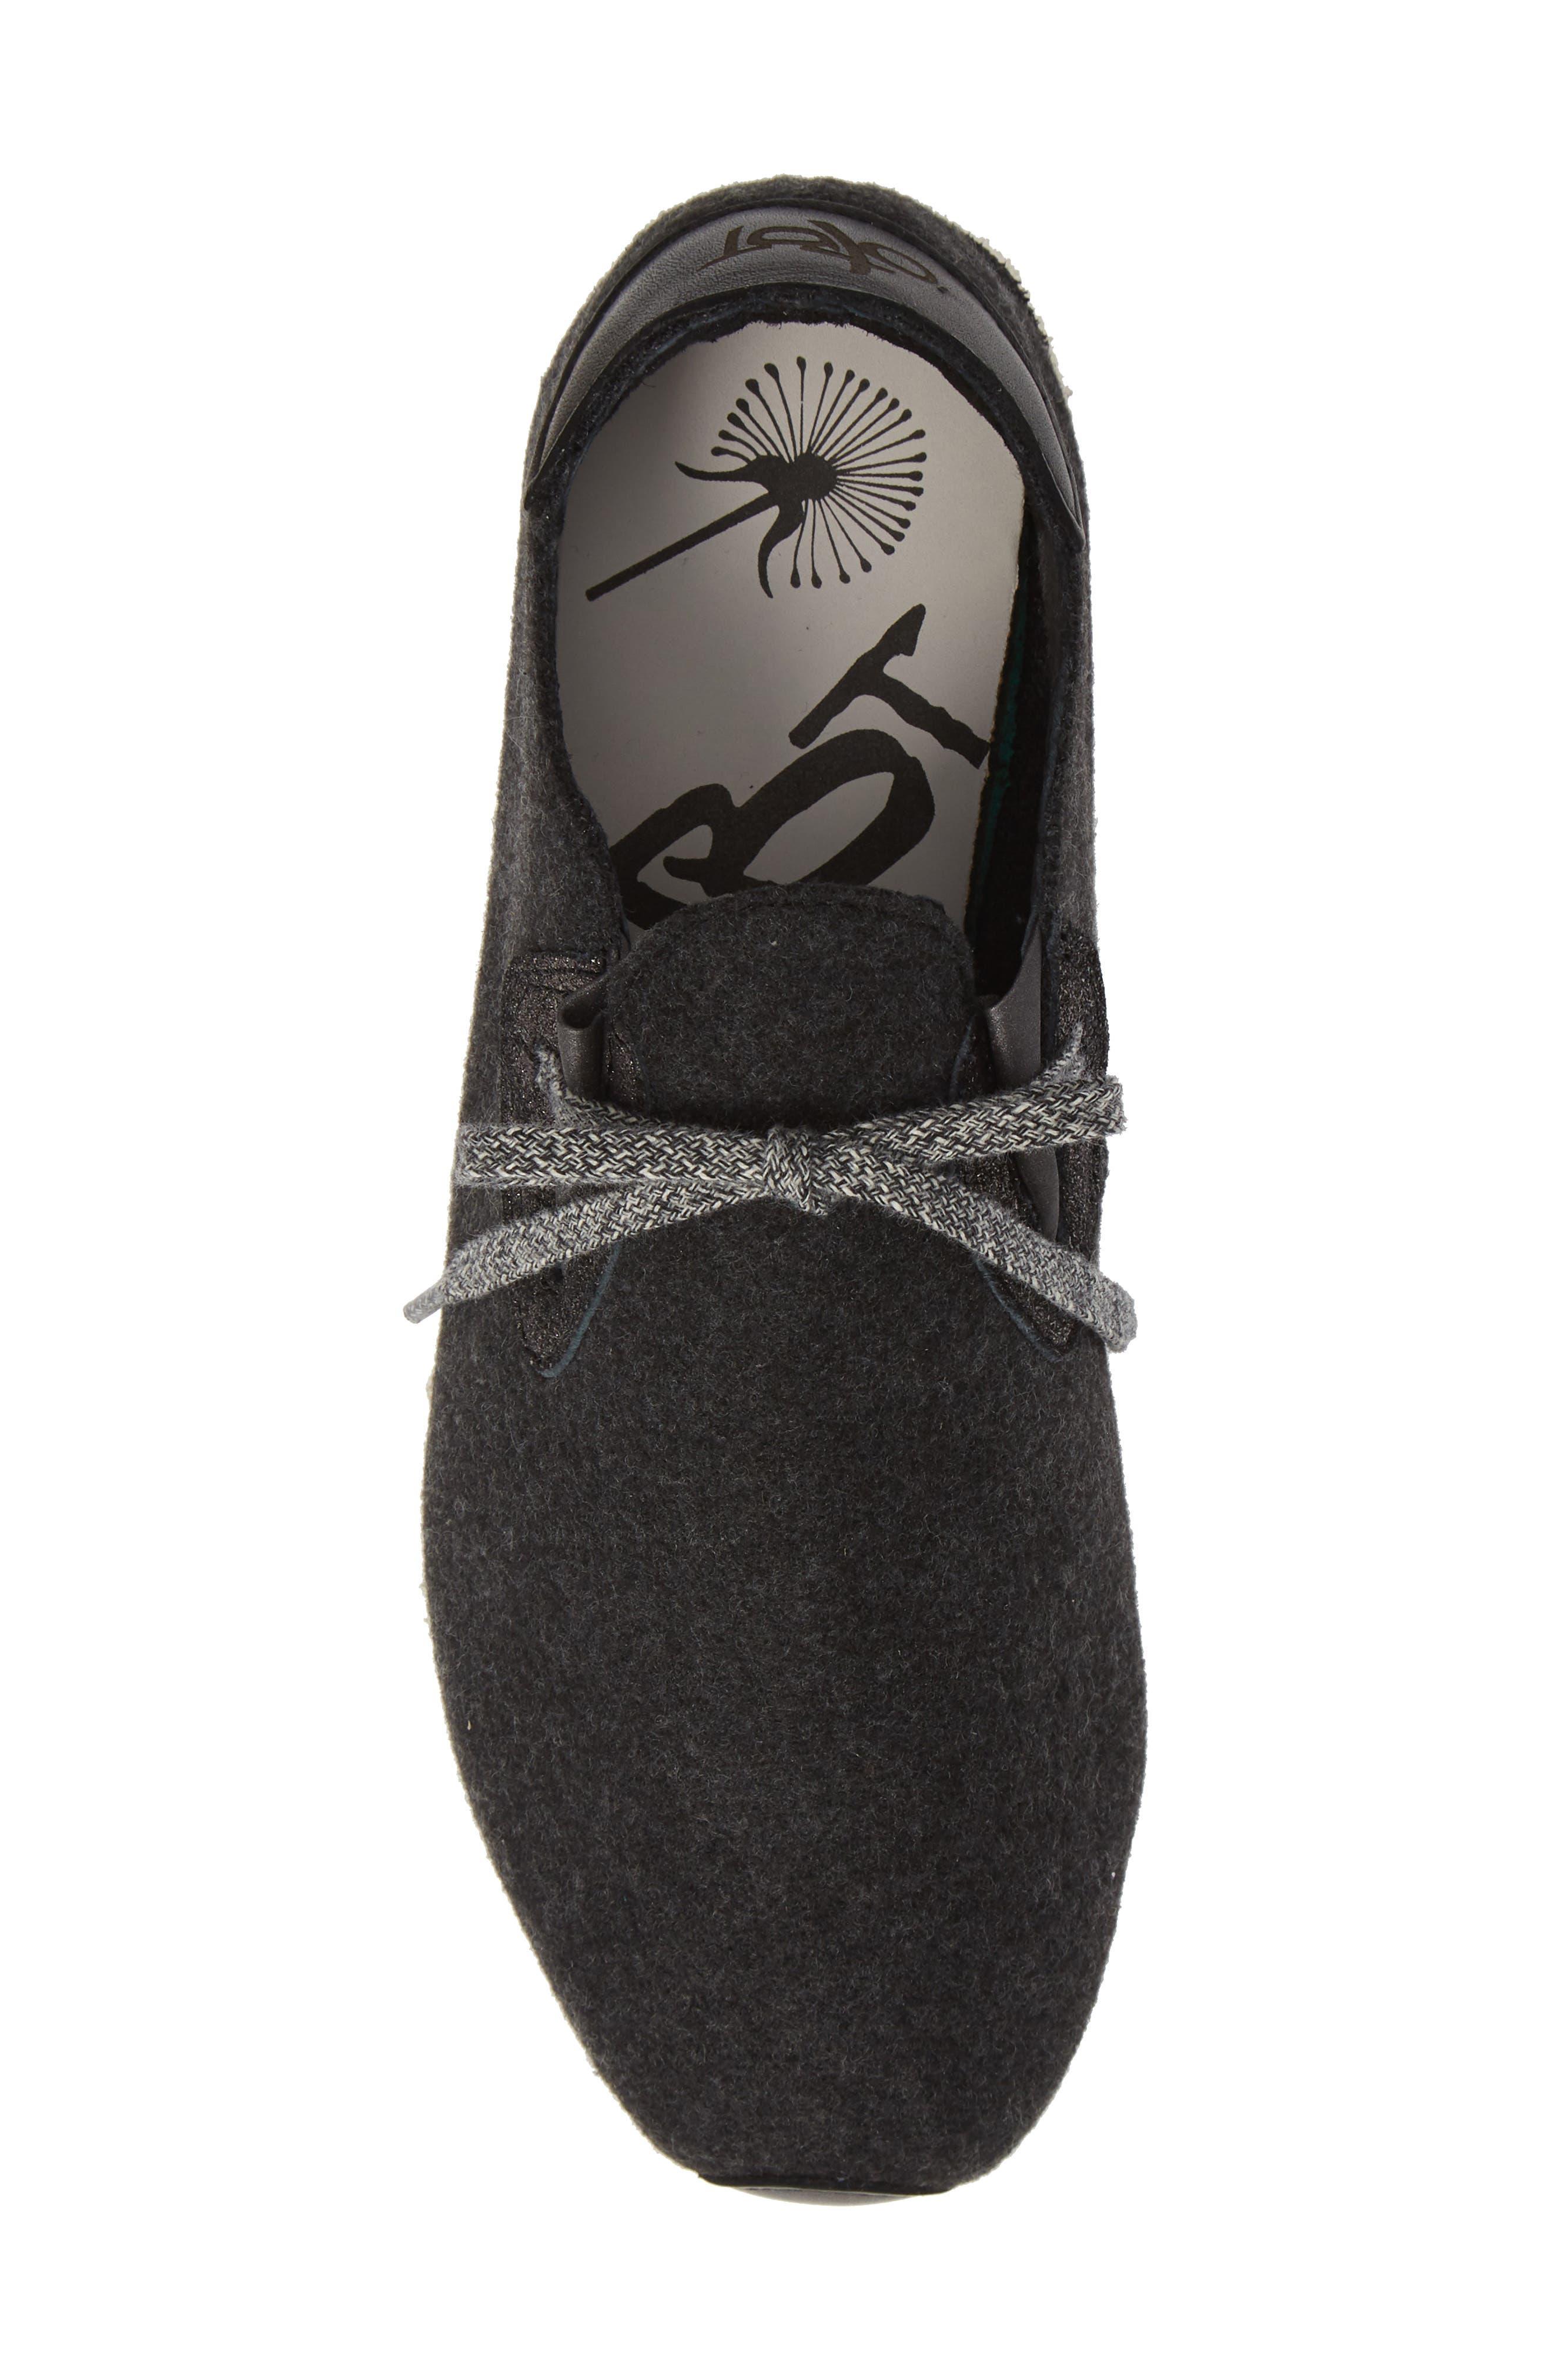 Radius Sneaker,                             Alternate thumbnail 5, color,                             CHARCOAL